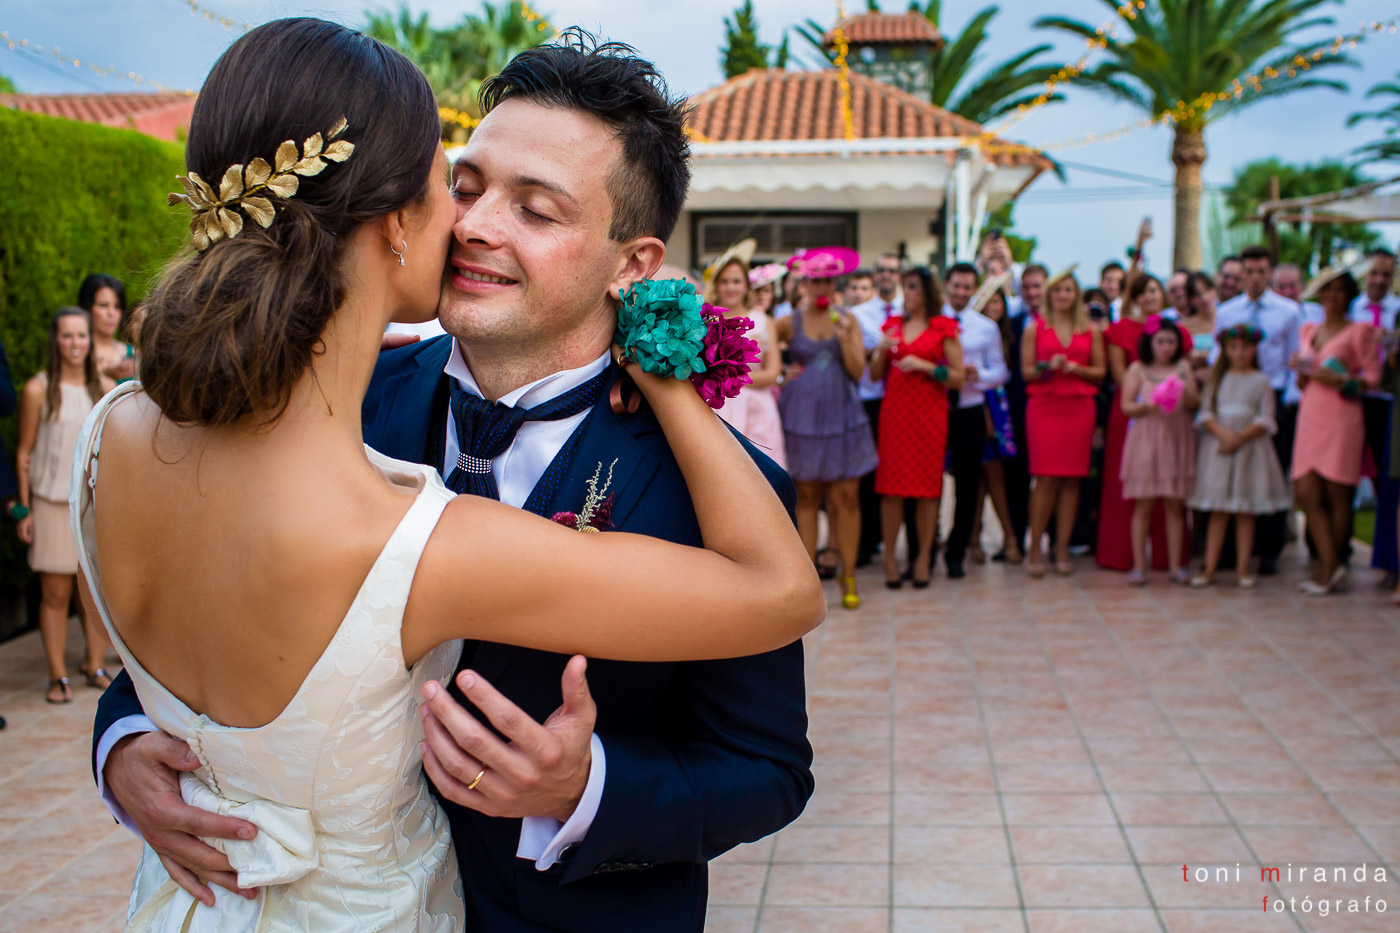 Baile de novios en banquete de boda en Aspe